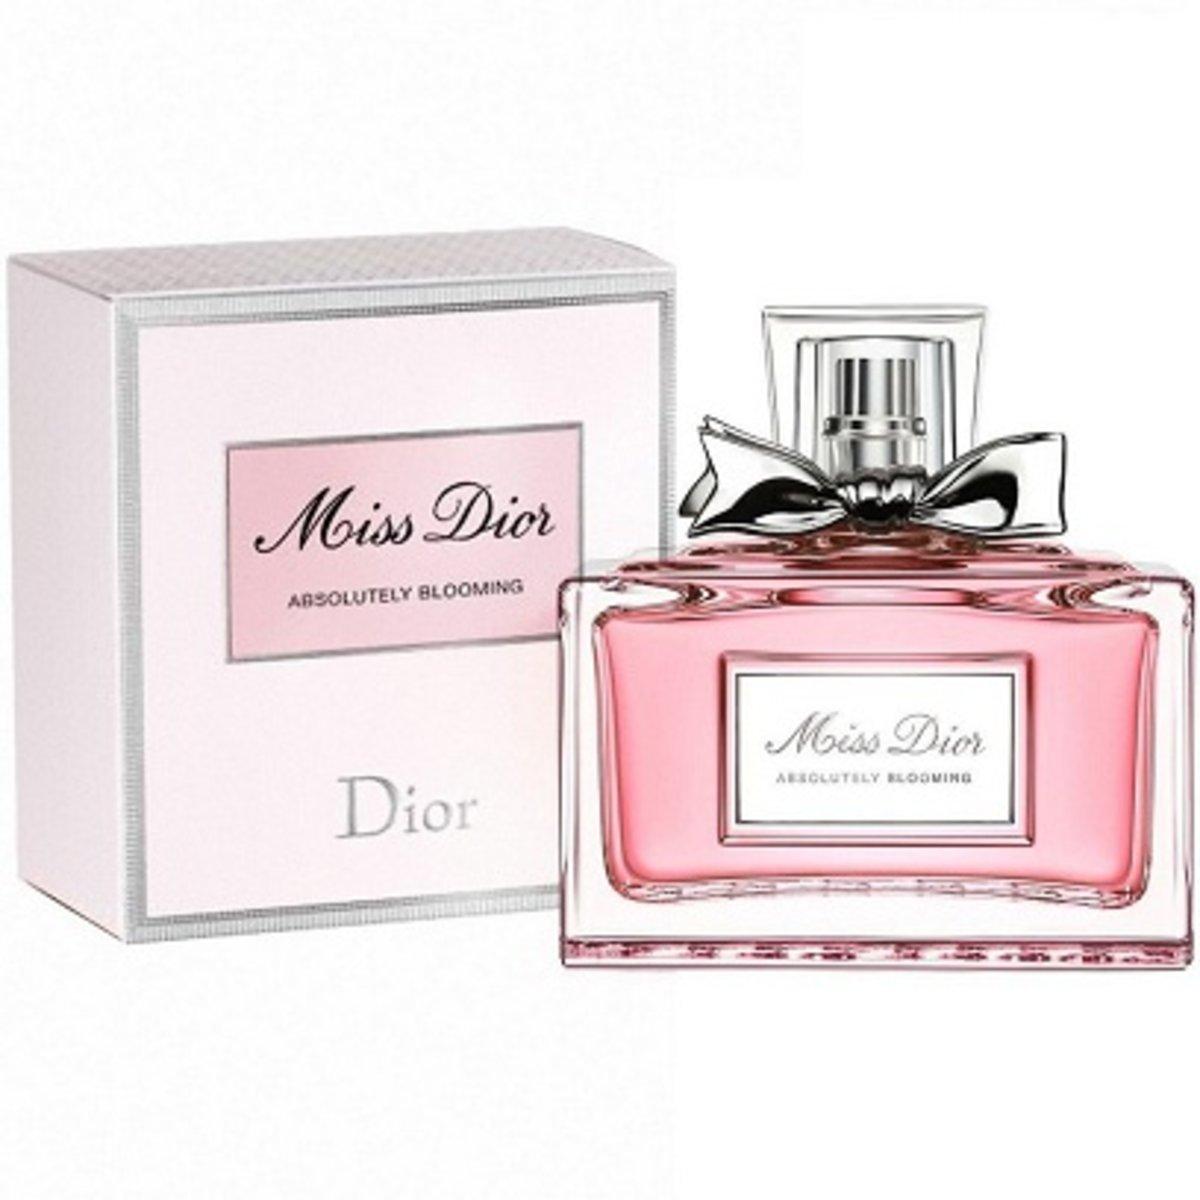 Miss Dior Absolutely Blooming Eau de Parfum (100ml) [Parallel Import]